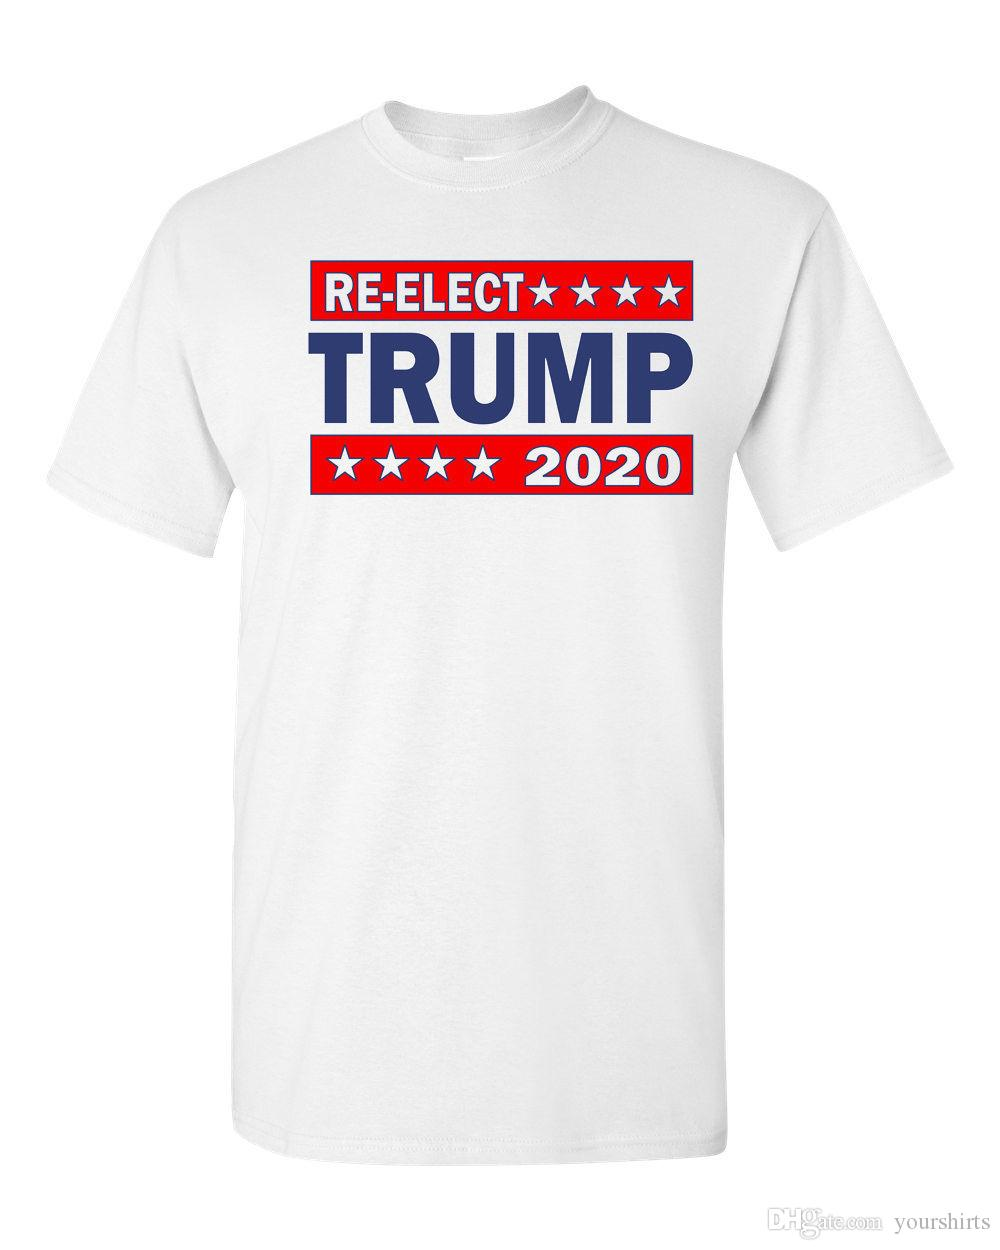 bb3d9c21d Re Elect Donald Trump President 2020 Make America Great Again Men´s T Shirt  1602 T Shirt Men Boy Classic Short Sleeve Thanksgiving Day Custo T Shirt  Deals ...